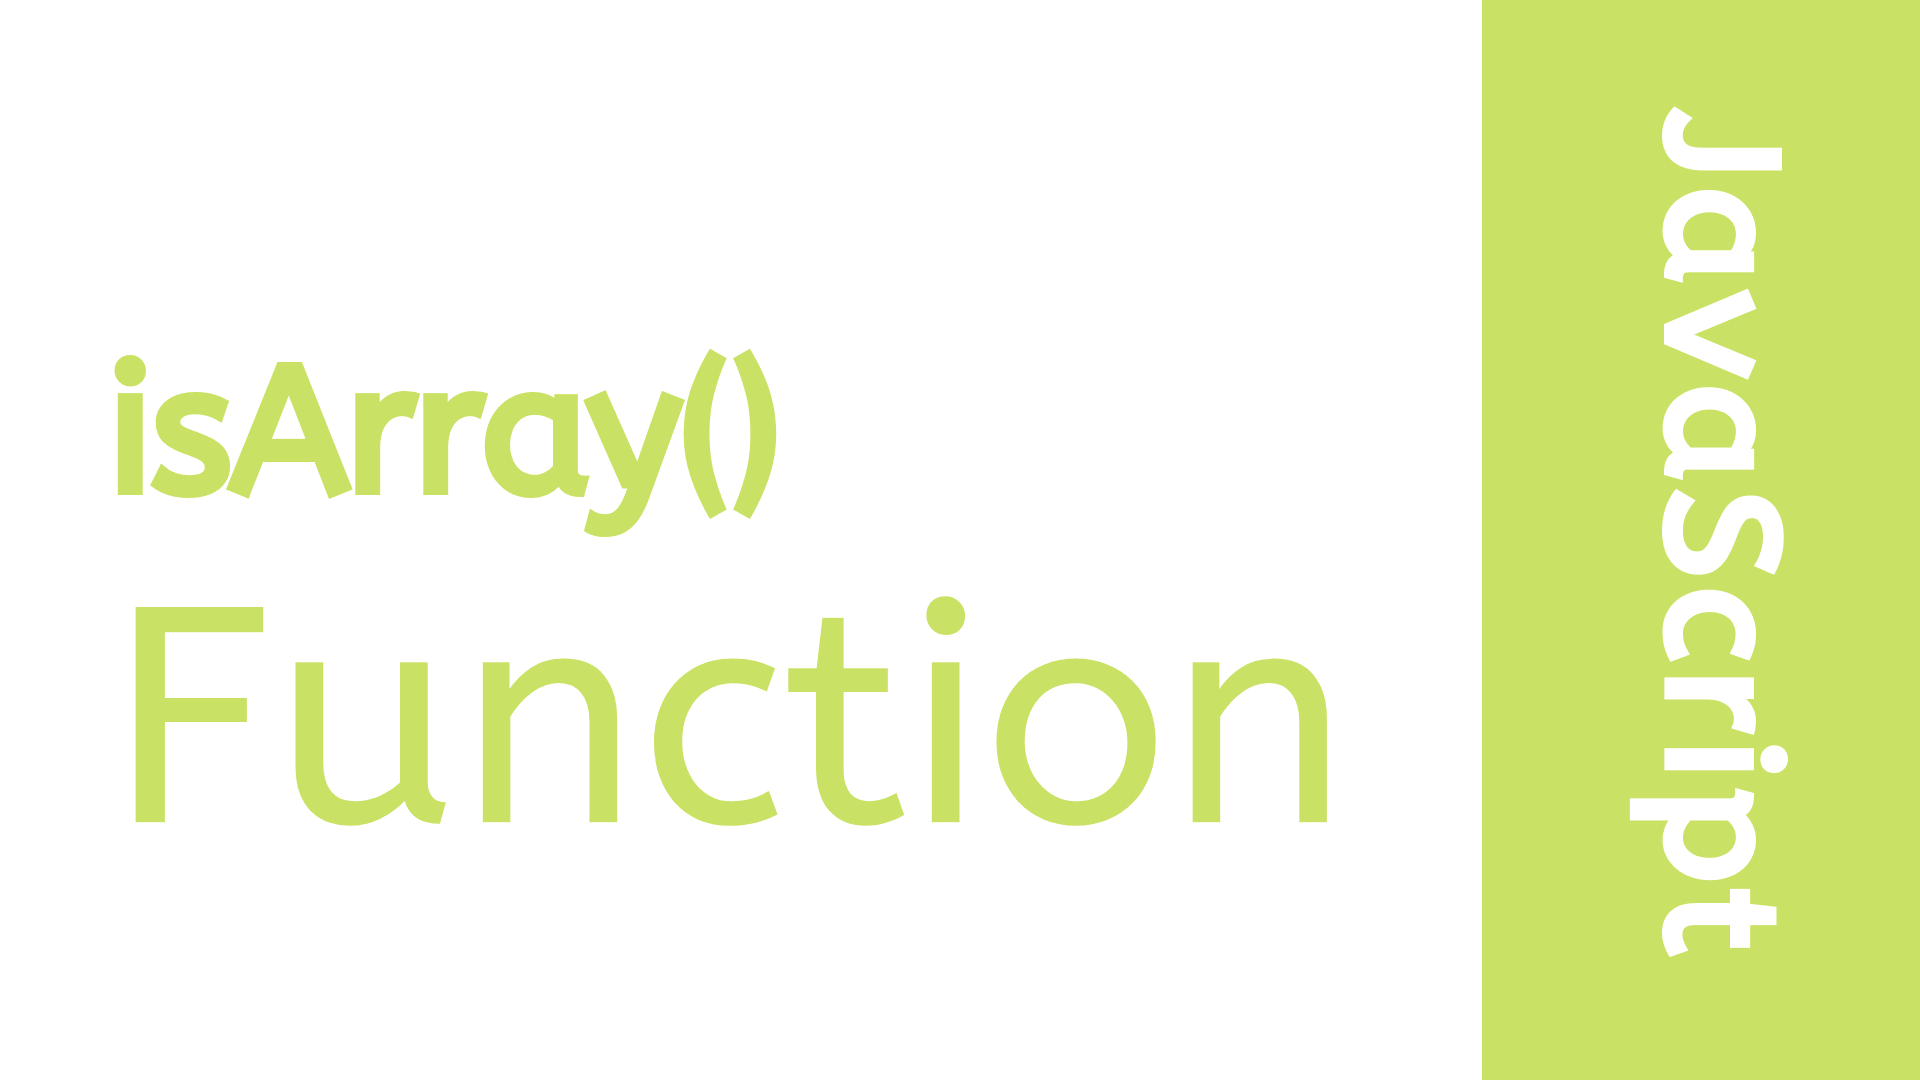 JavaScript isArray() Function